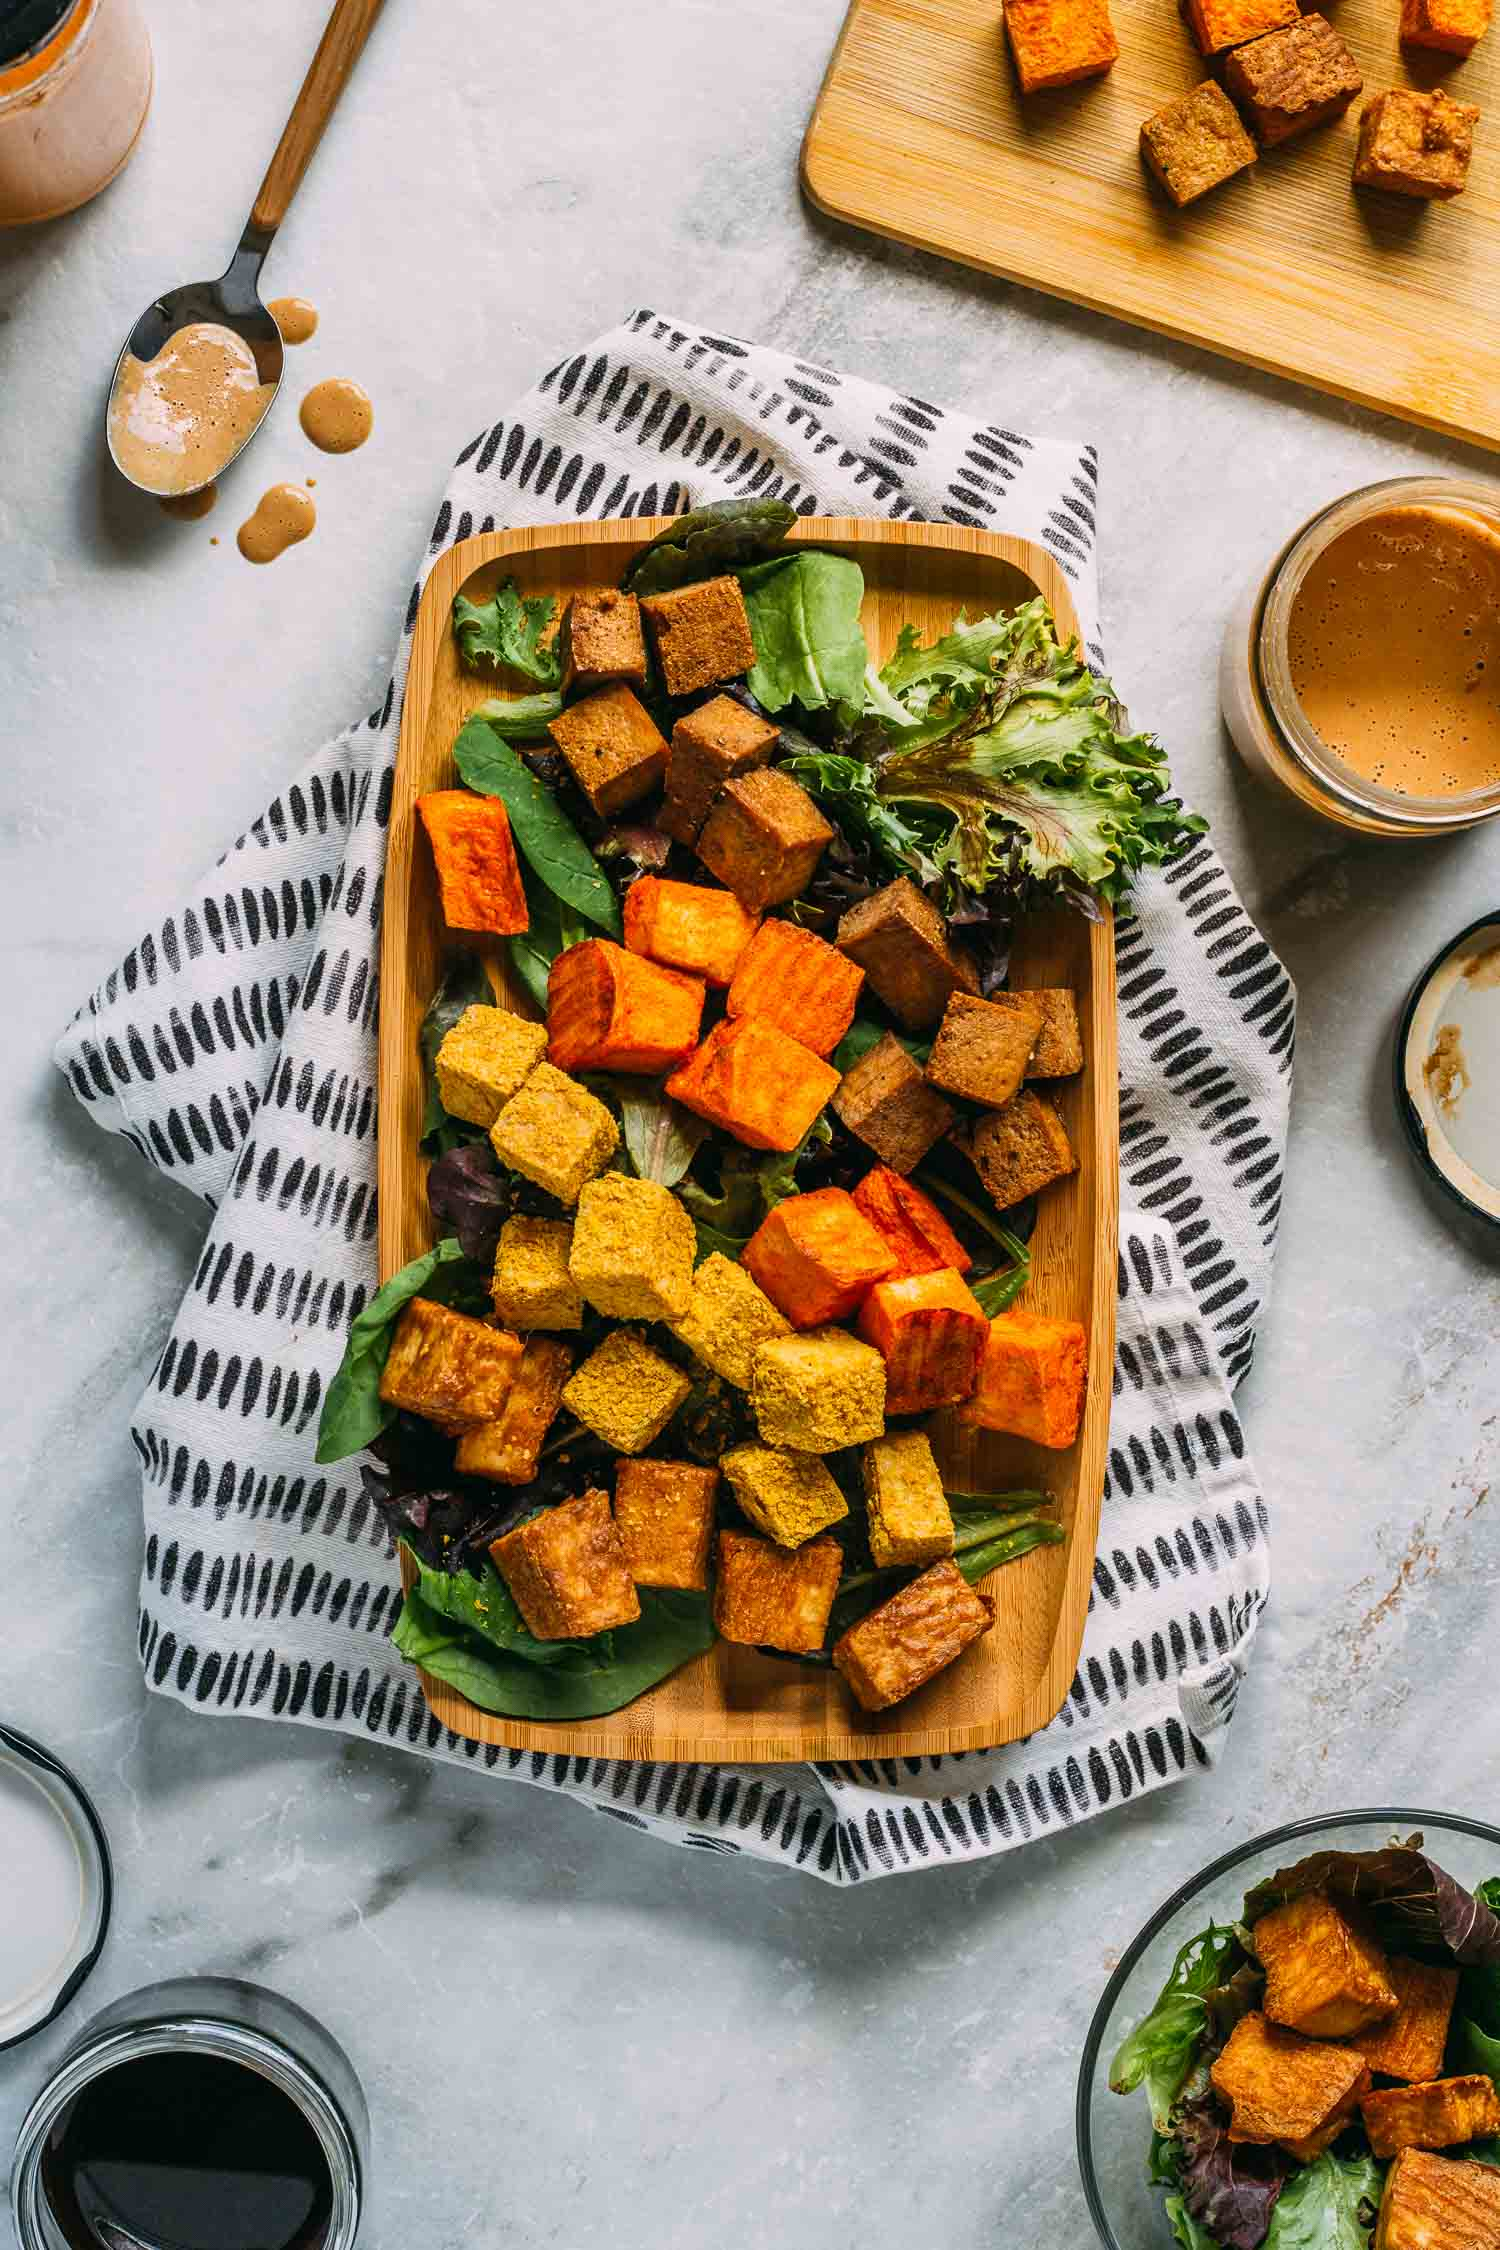 Savory Oil-Free Baked Tofu - Four Ways #tofu #baked #appetizer #snack #entree #recipe #plant-based #vegan #oil-free #protein #vegetarian #buffalo #liquid aminos #nutritional yeast #recipes #thai #asian #wfpbno #wfpb #meatless Monday